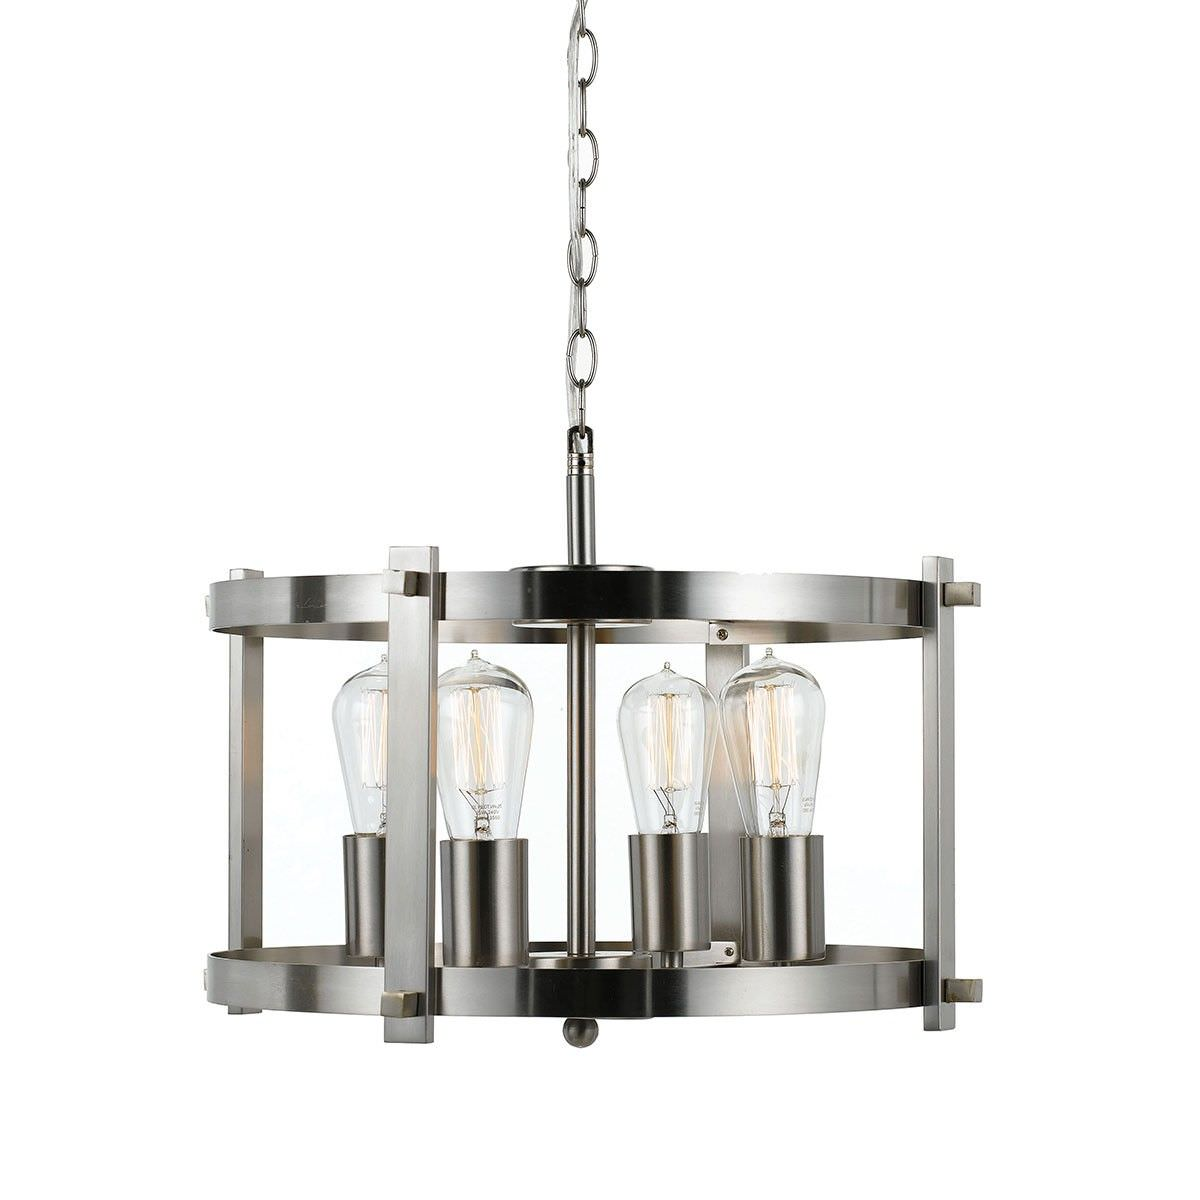 Finley Metal Pendant Light, Small, Nickel